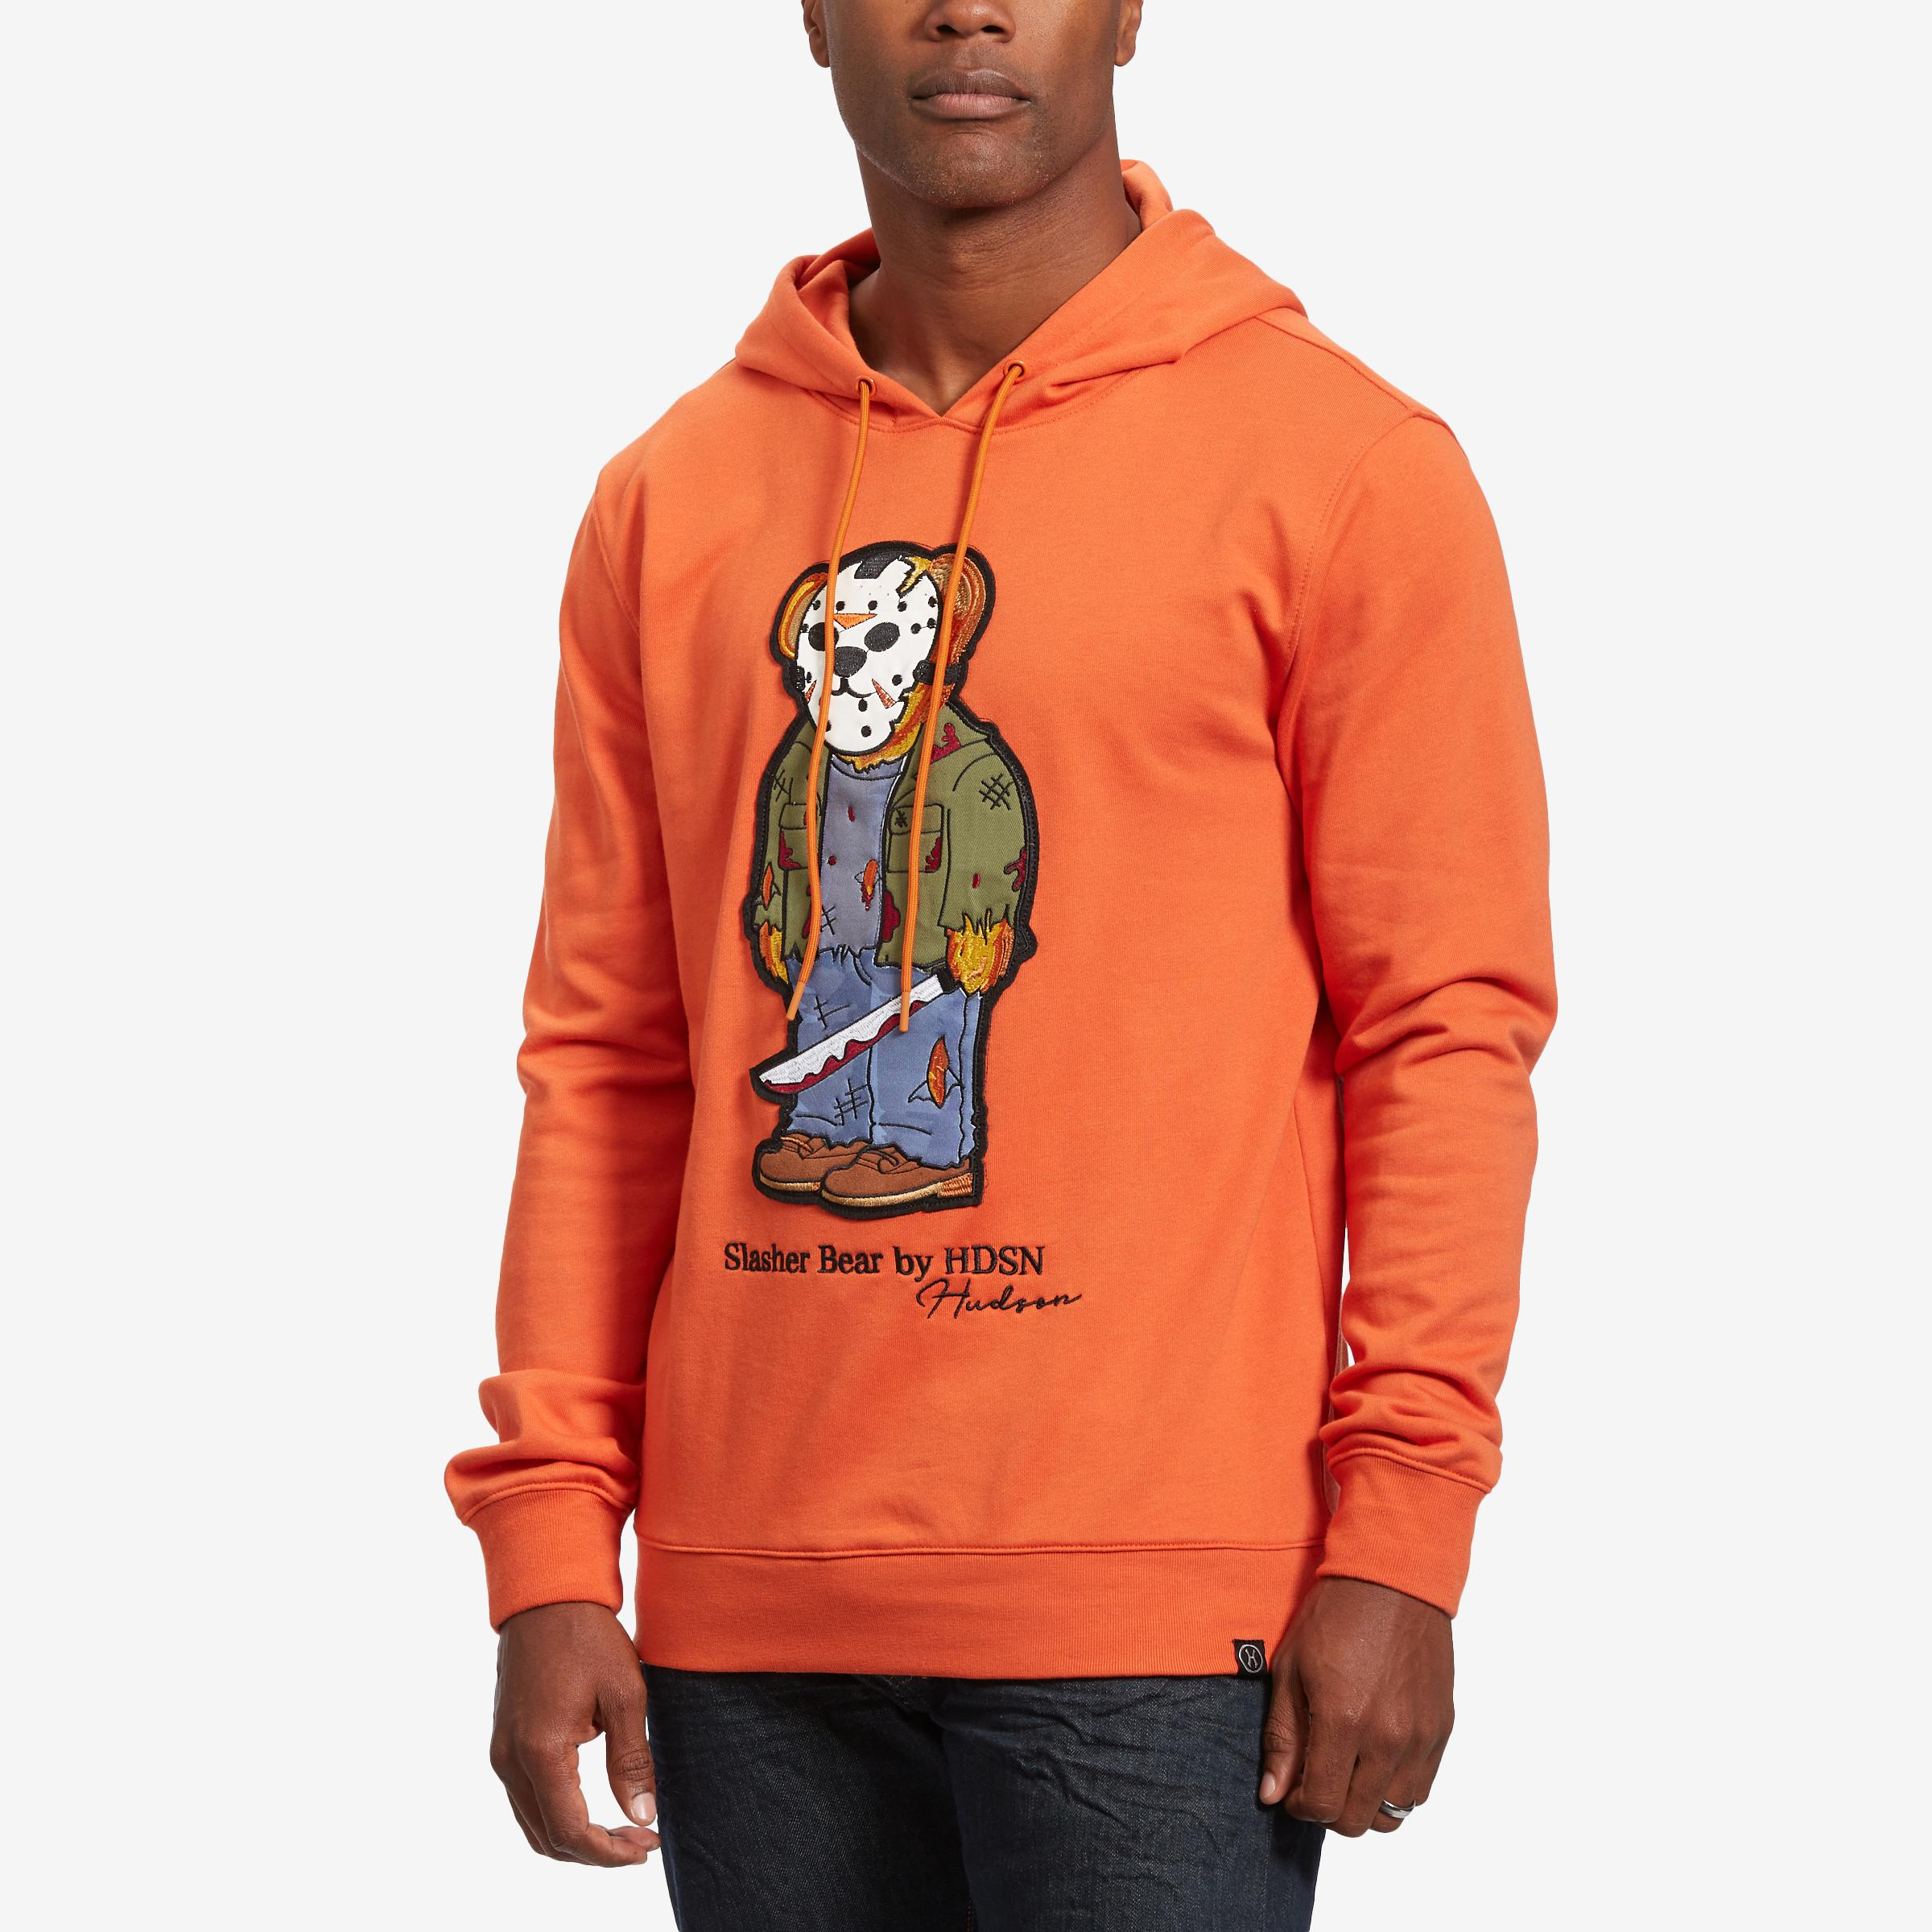 Slasher Bear Hoodie